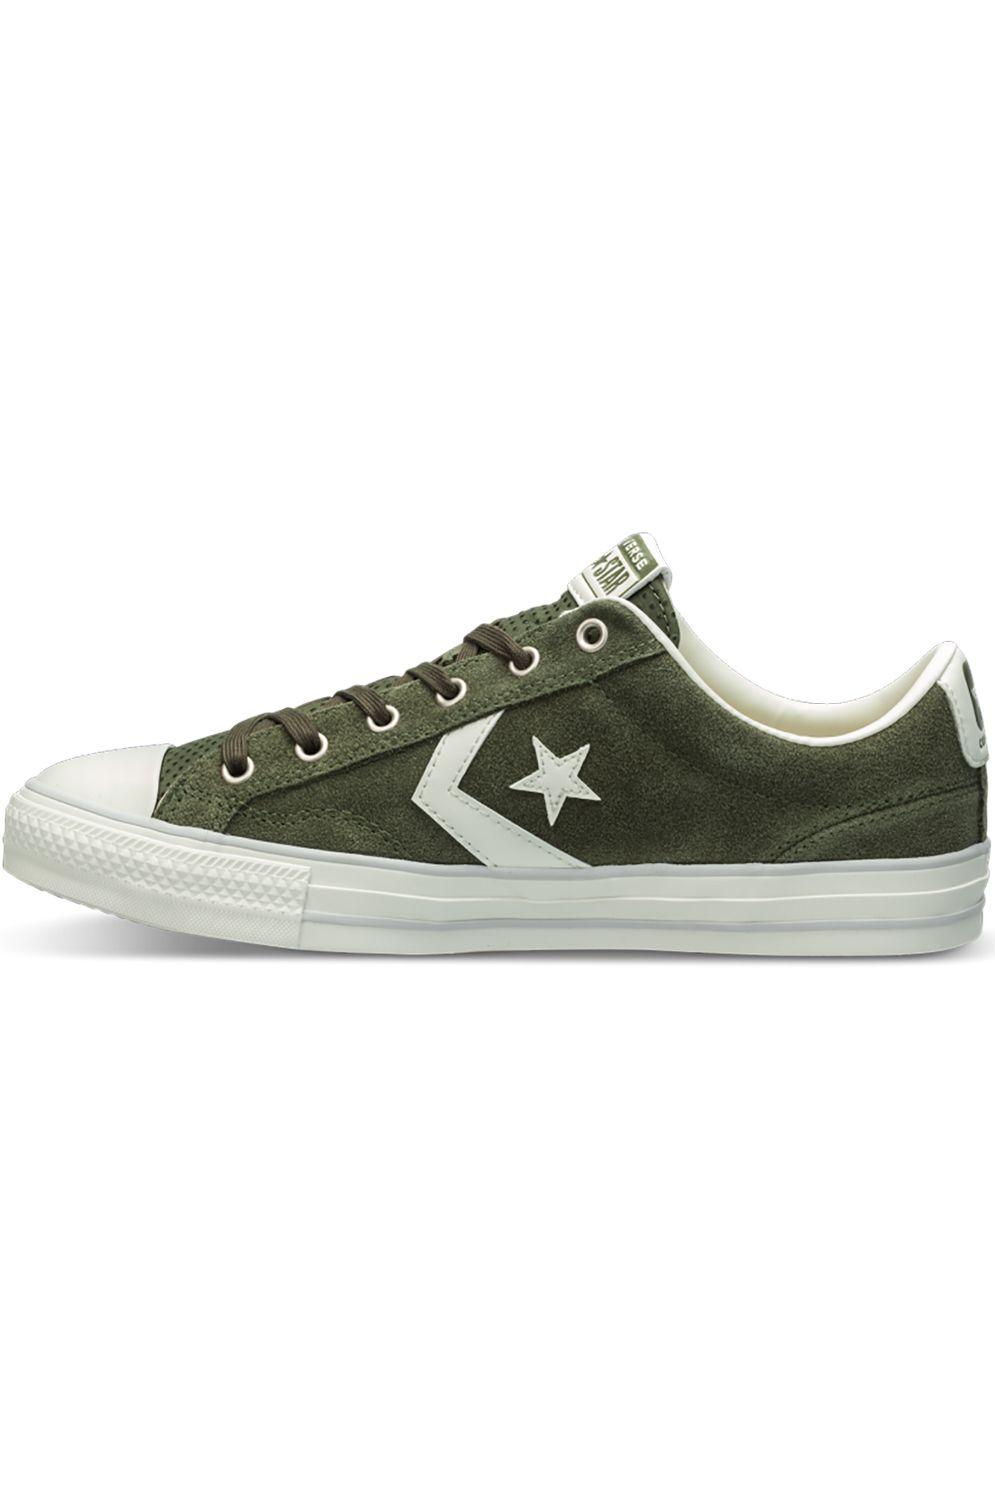 Tenis Converse STAR PLAYER OX Field Surplus/Egret/Mouse